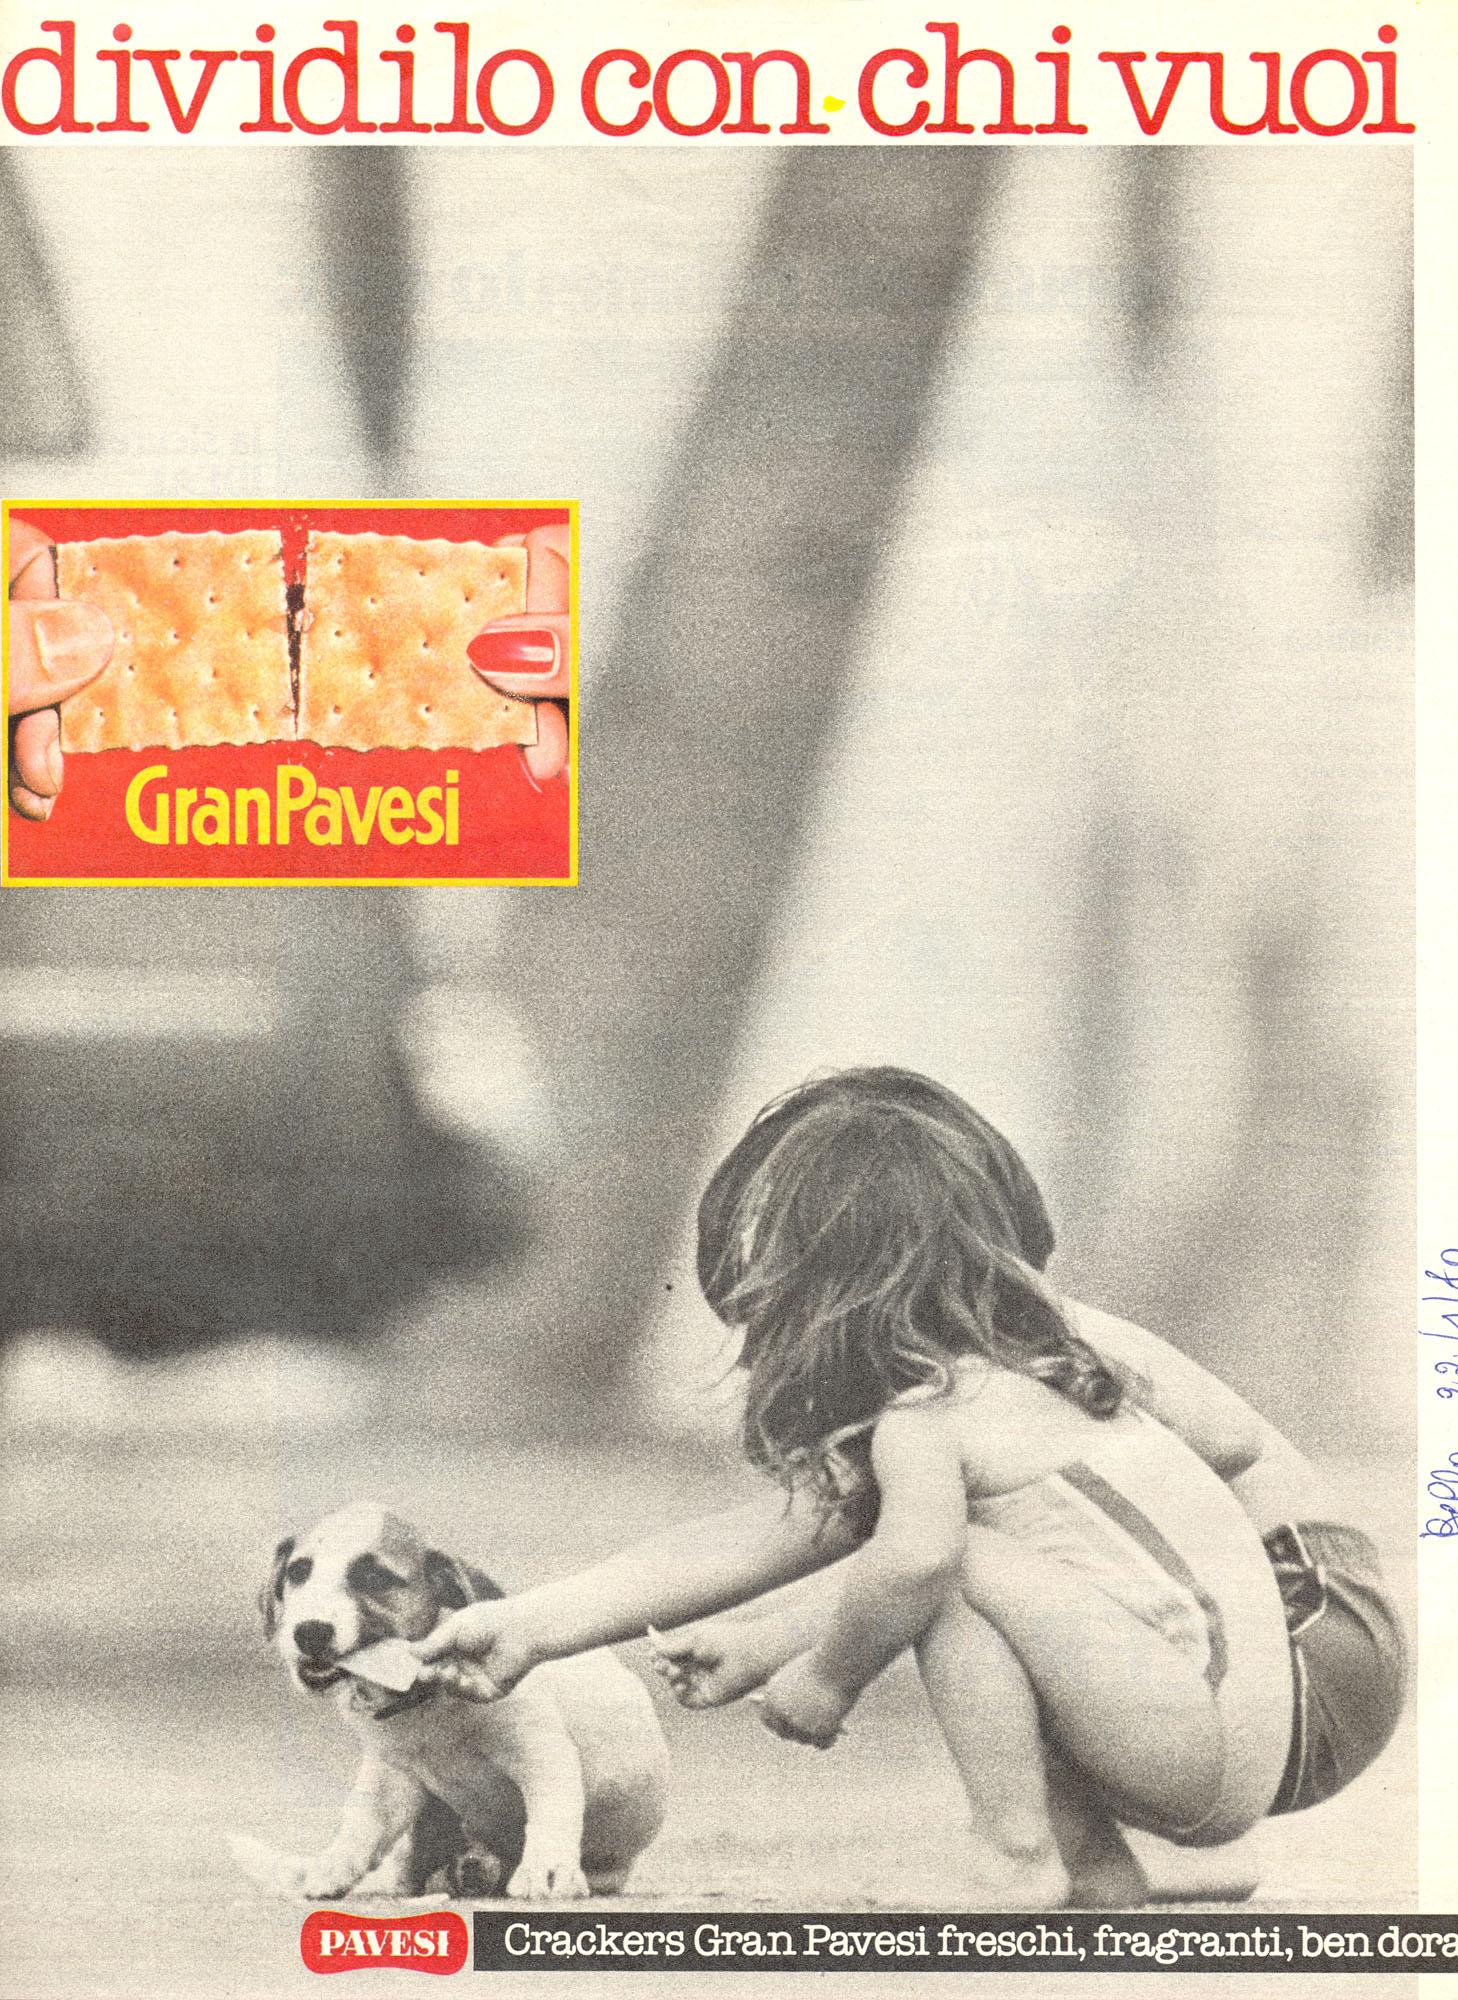 Pubblicità stampa Crakers Gran Pavesi, 1980